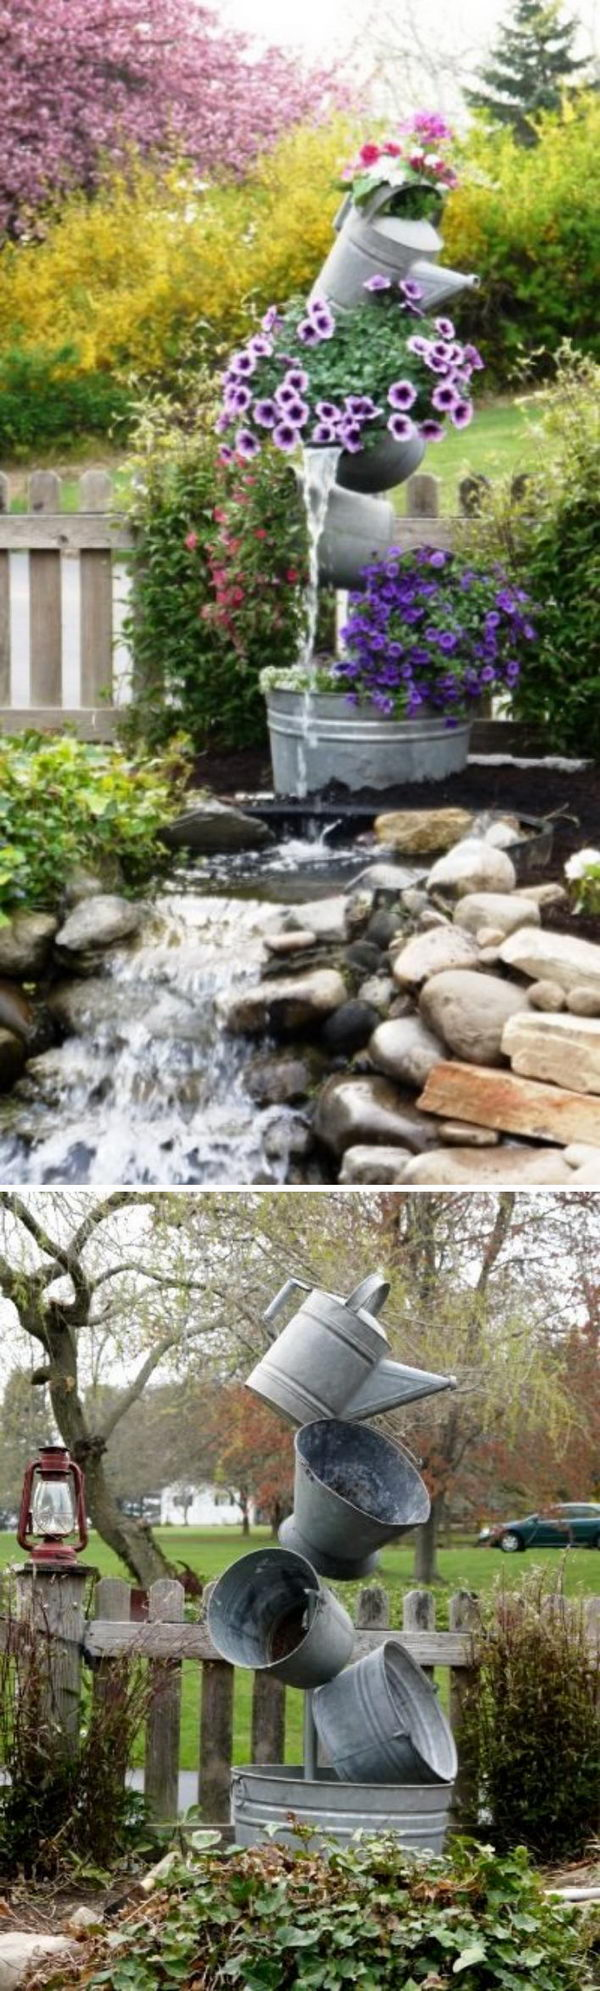 Galvanized Tipsy Pots Water Fountain.